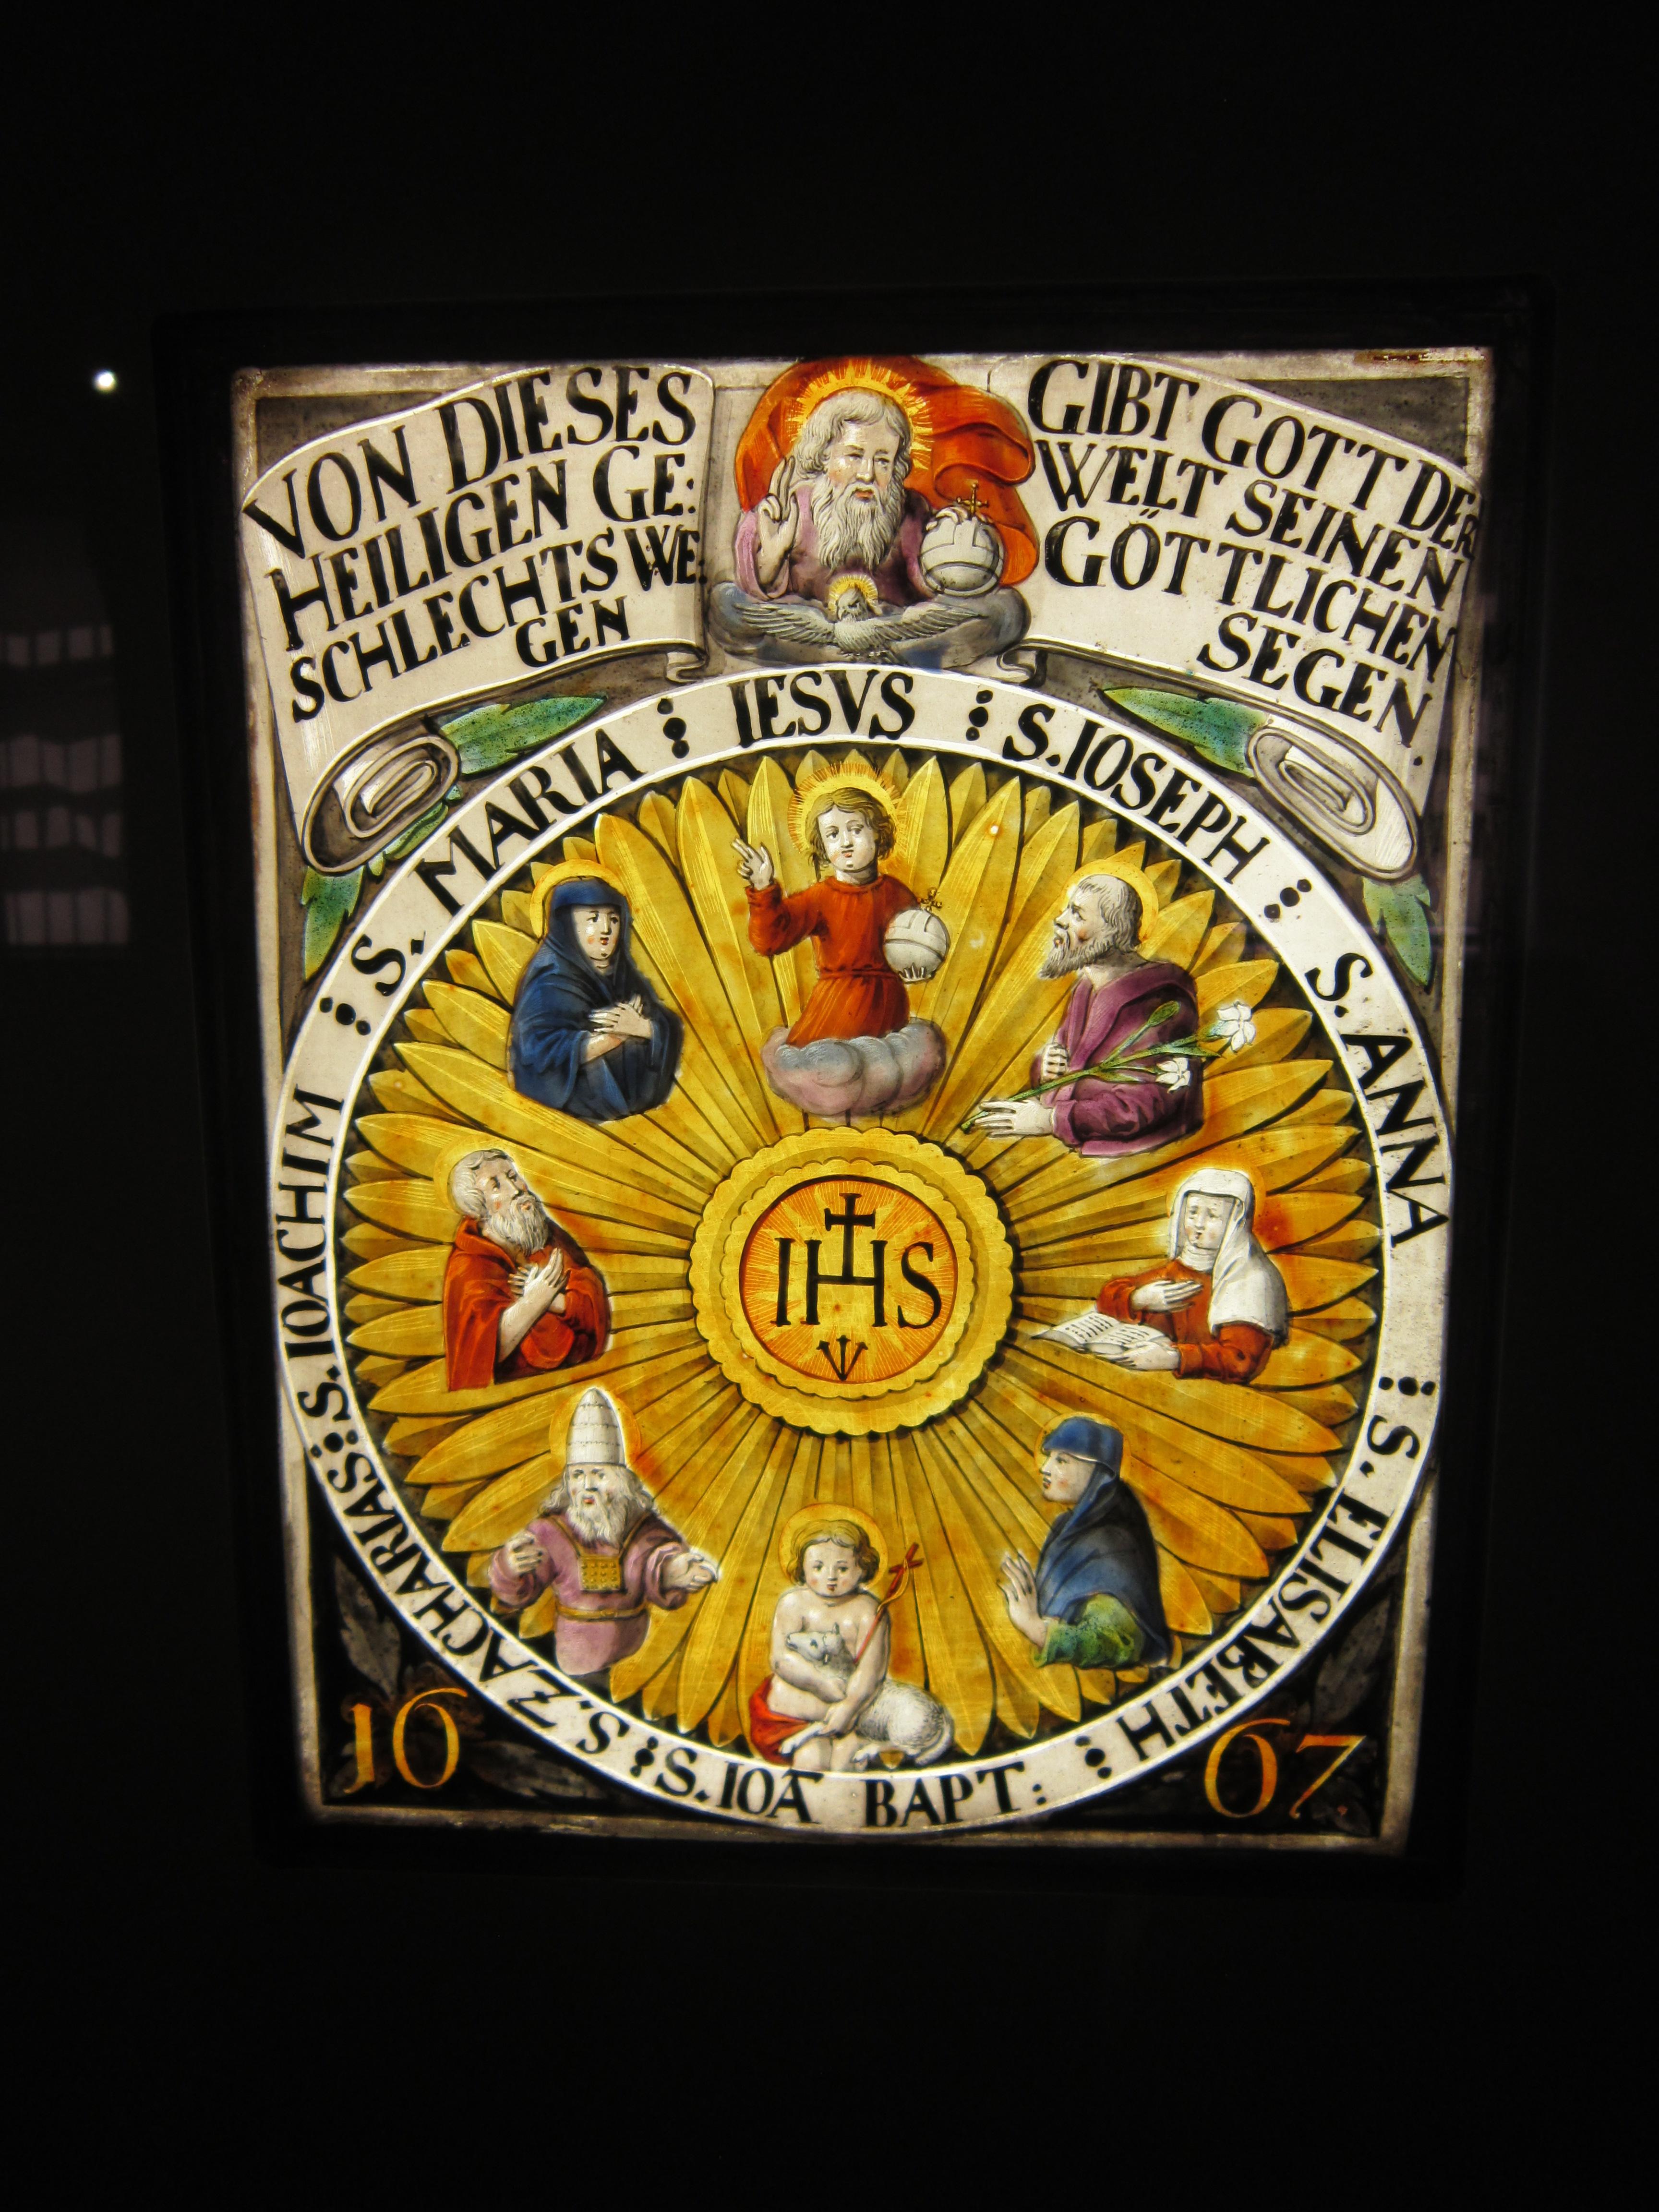 Bratislava museum - religious imagery